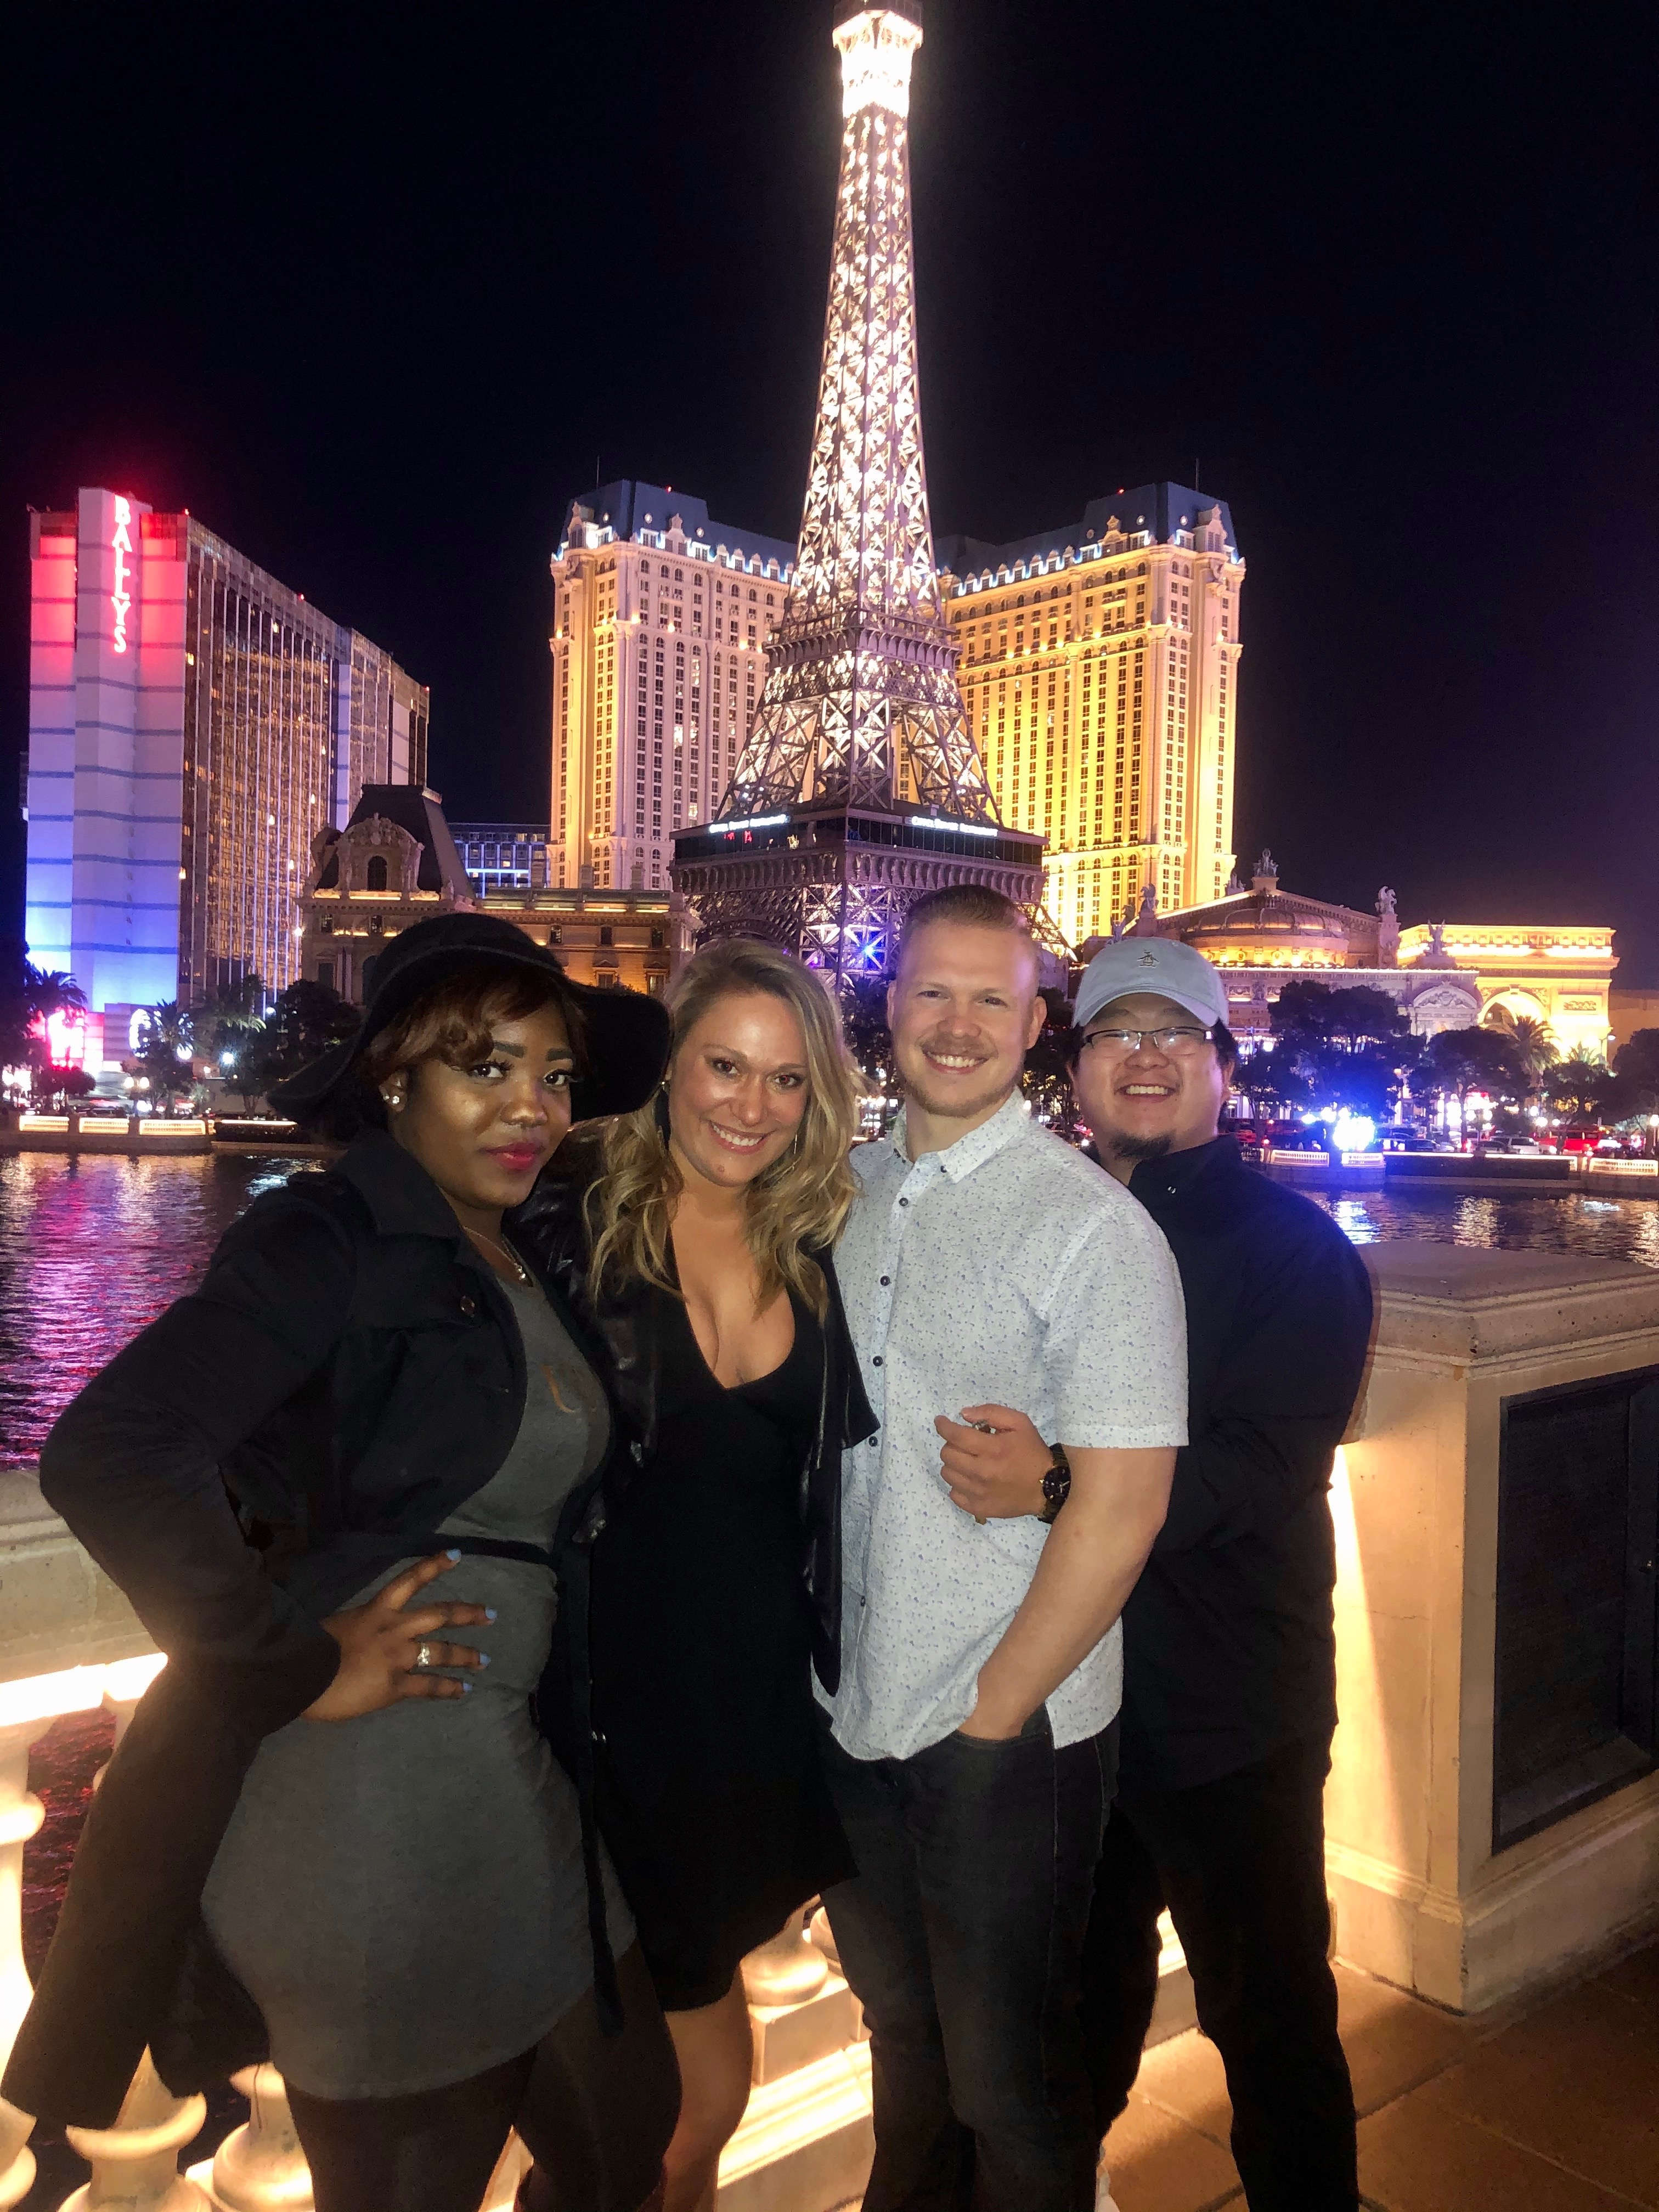 Alyria-Hannah-Kevin-Ra in Vegas